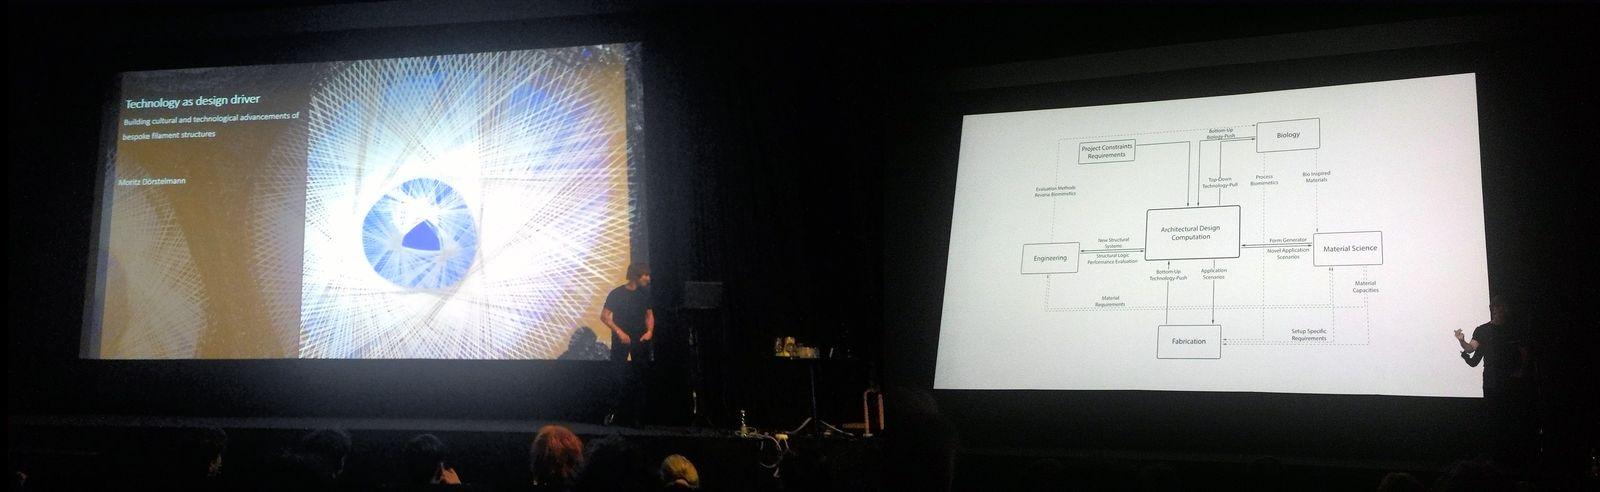 Moritz Dorstelmann/FIbR GmbH presentation